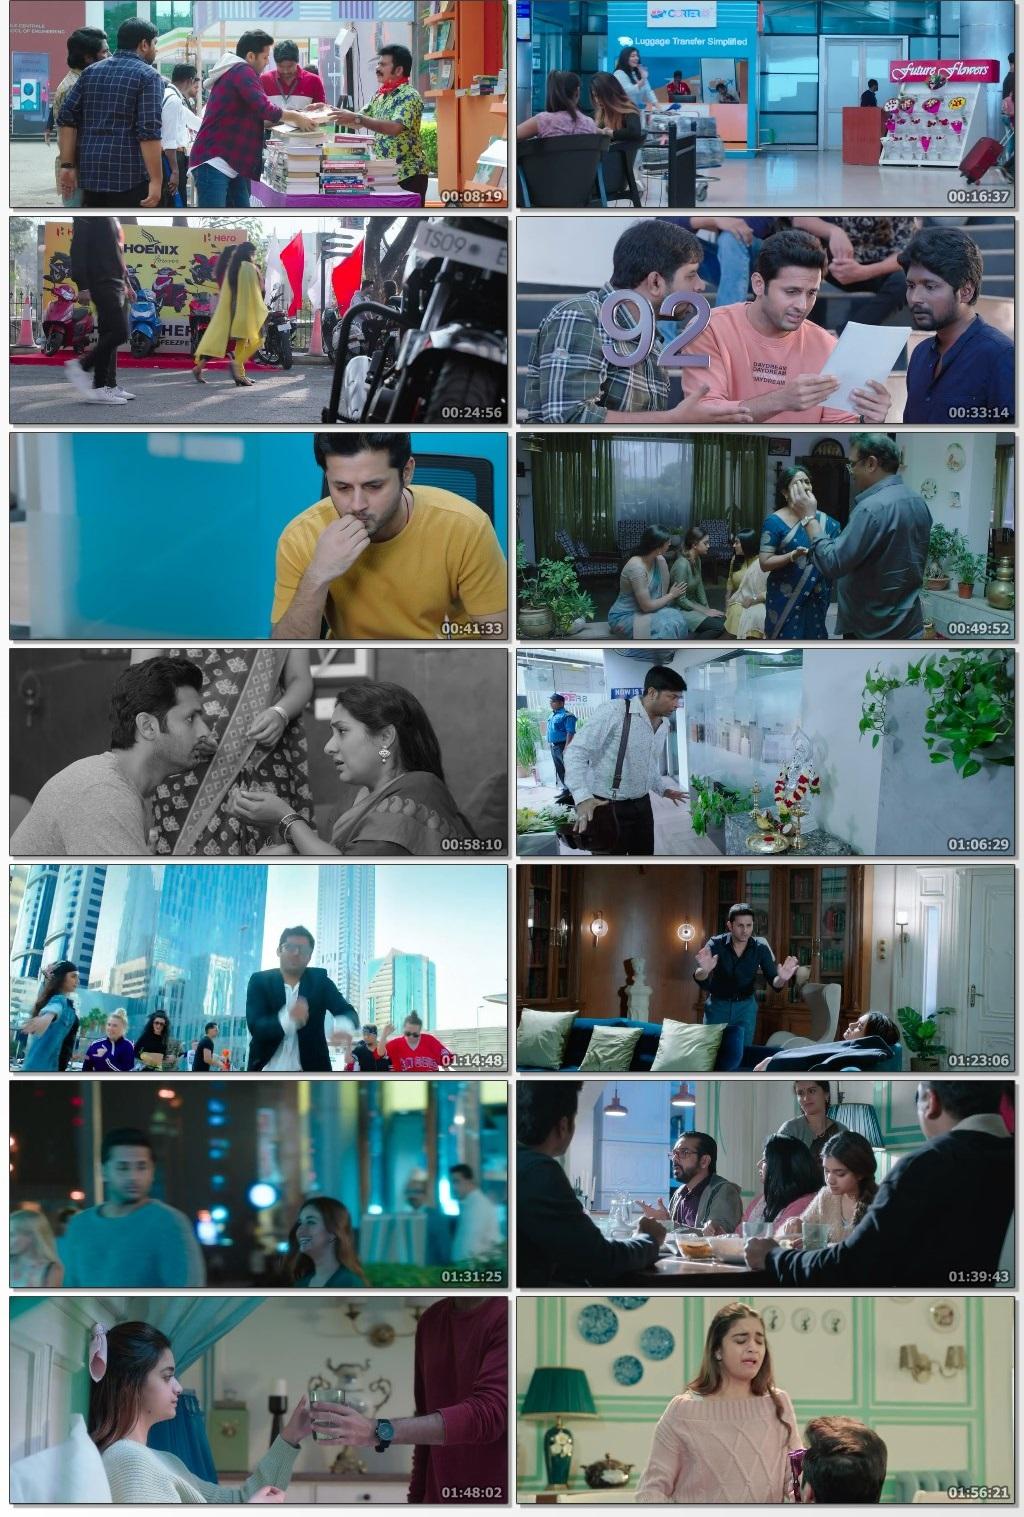 Rang-De-2021-www-9kmovies-cards-Telugu-720p-HDRip-ESub-1-1-GB-mkv-thumbs34e3eb2f5e89974e